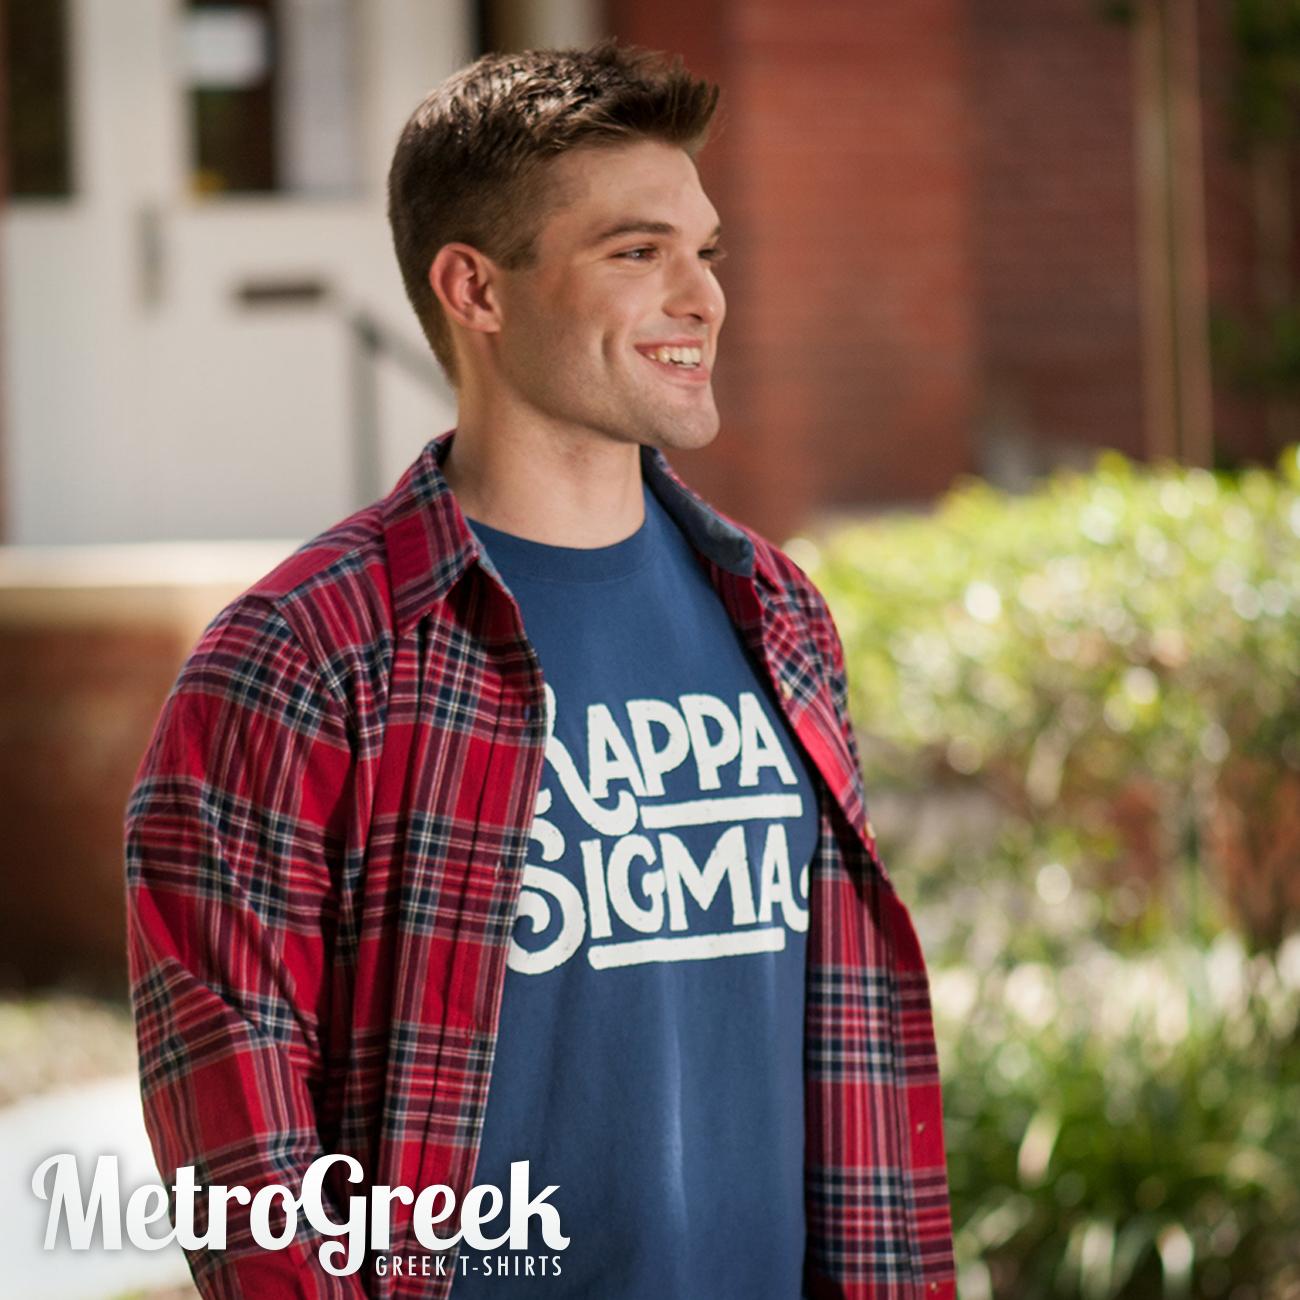 Kappa Sigma Rush T-shirt